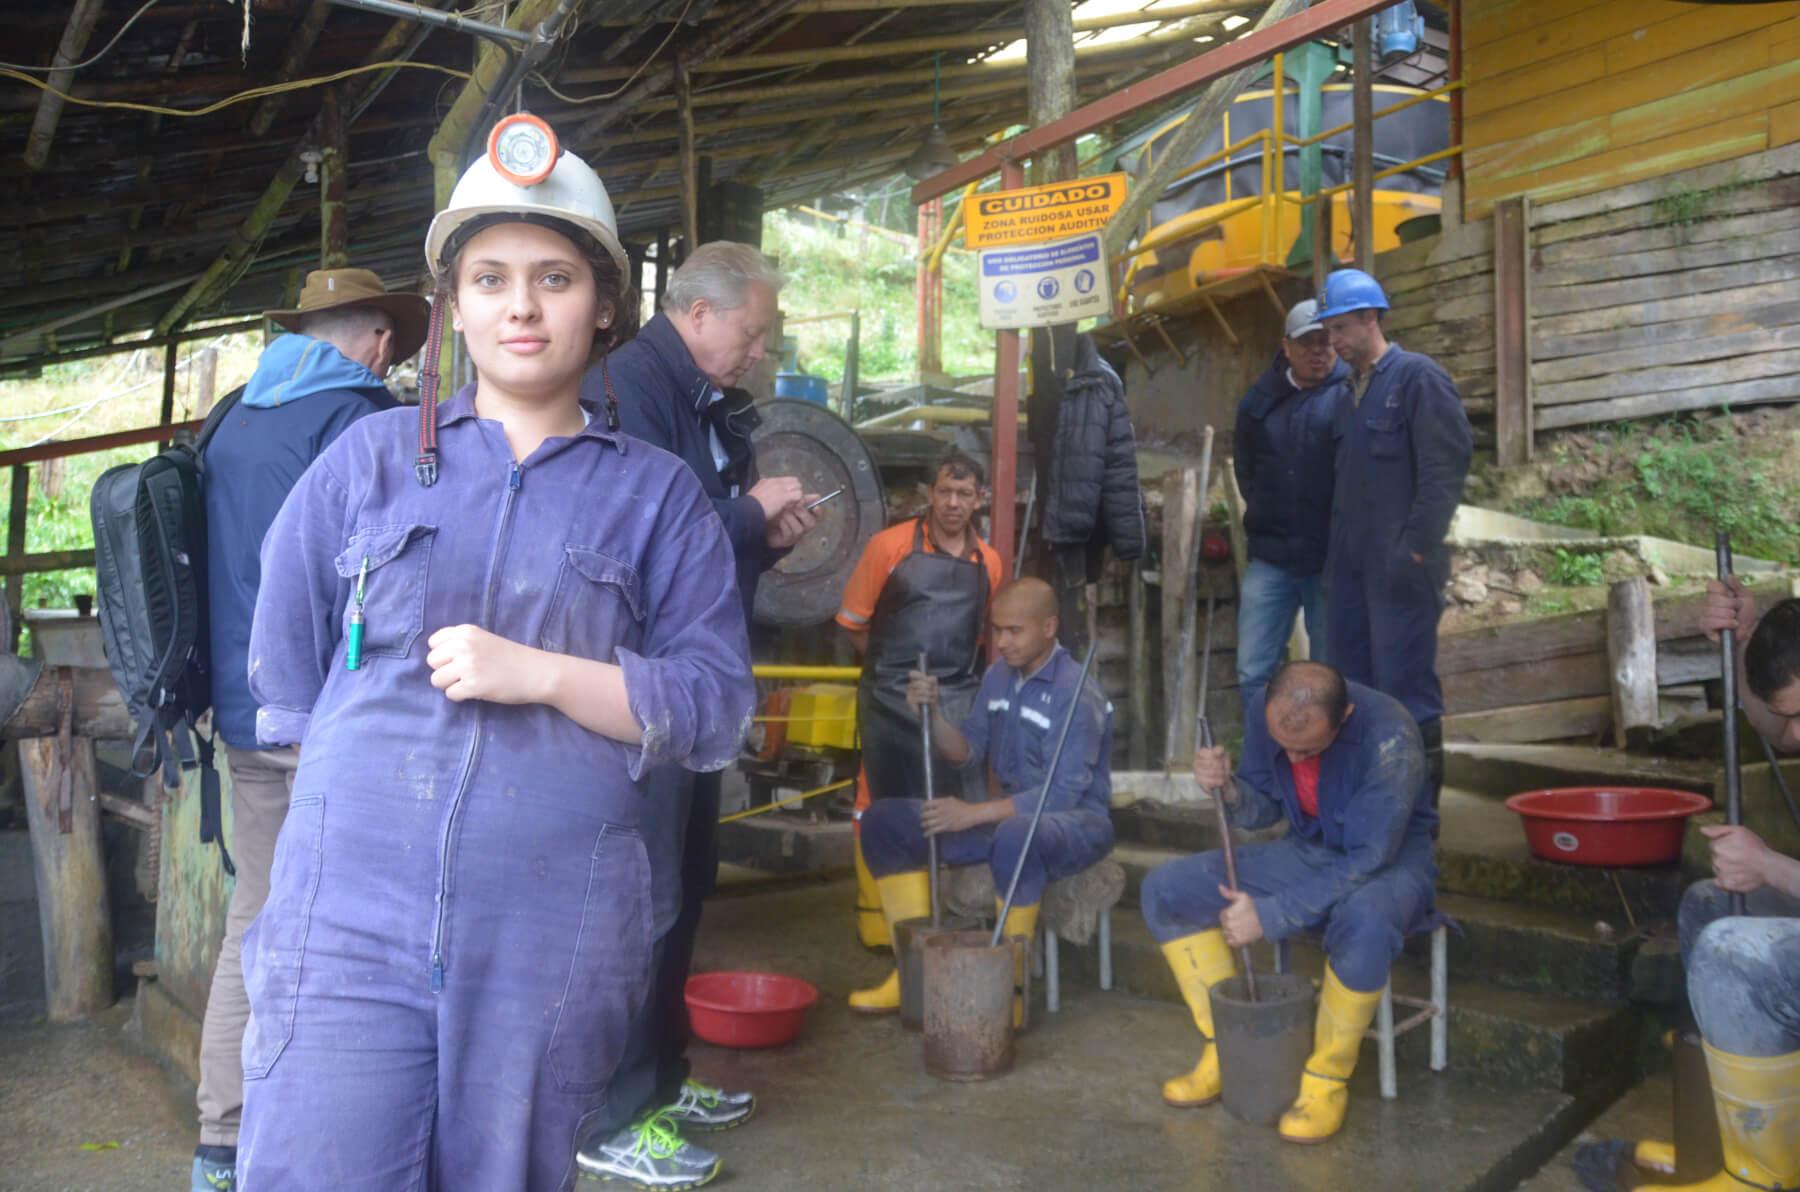 Daniela, ingeniera de la mina La Coqueta LTD, Manizales, Colombia.  (c) ARM